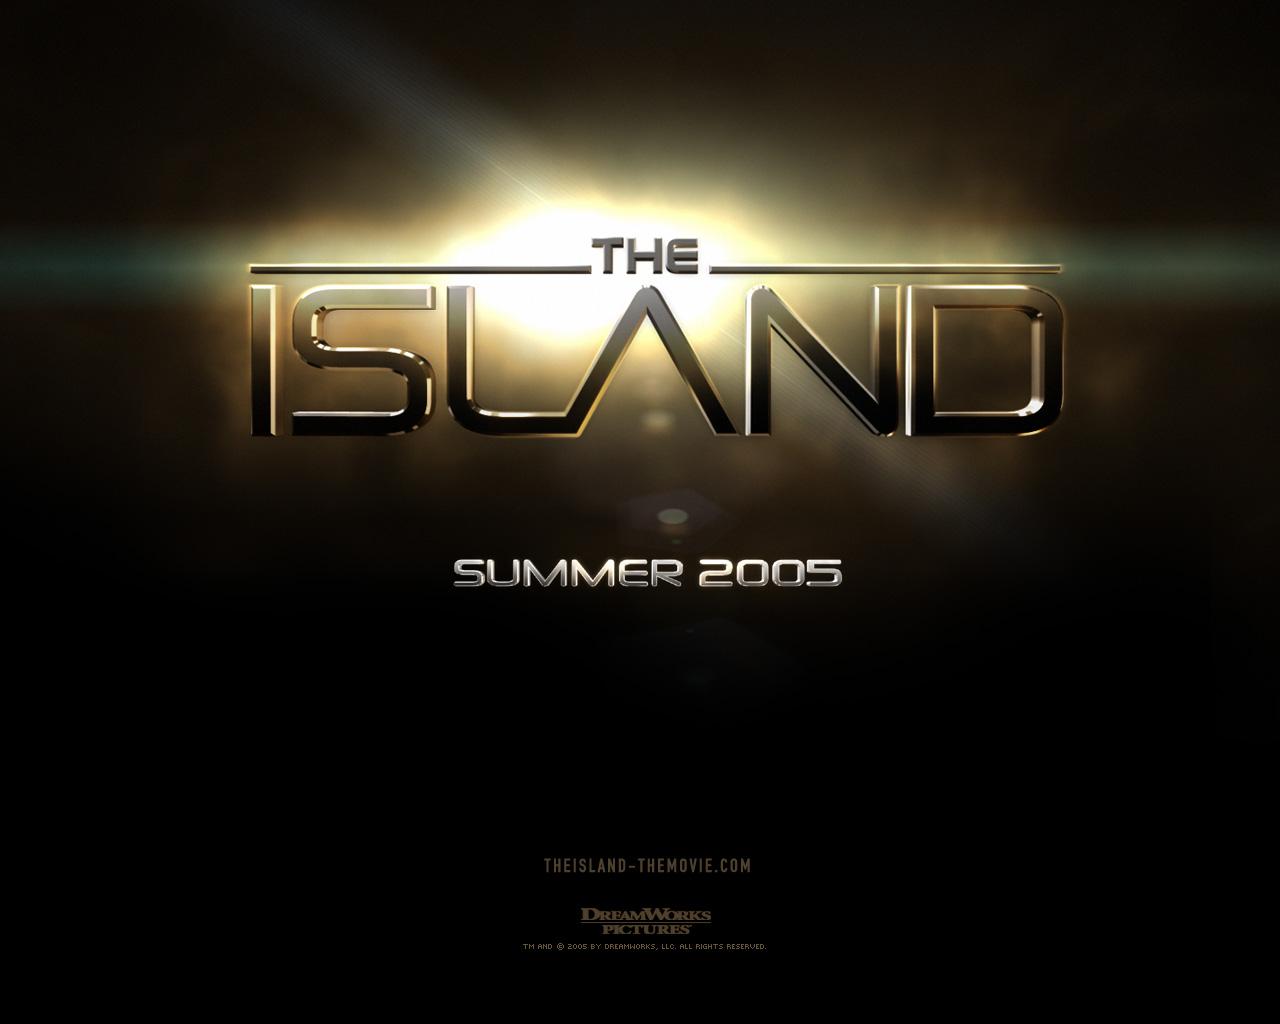 The Island! - The Island Wallpaper (25396831) - Fanpop